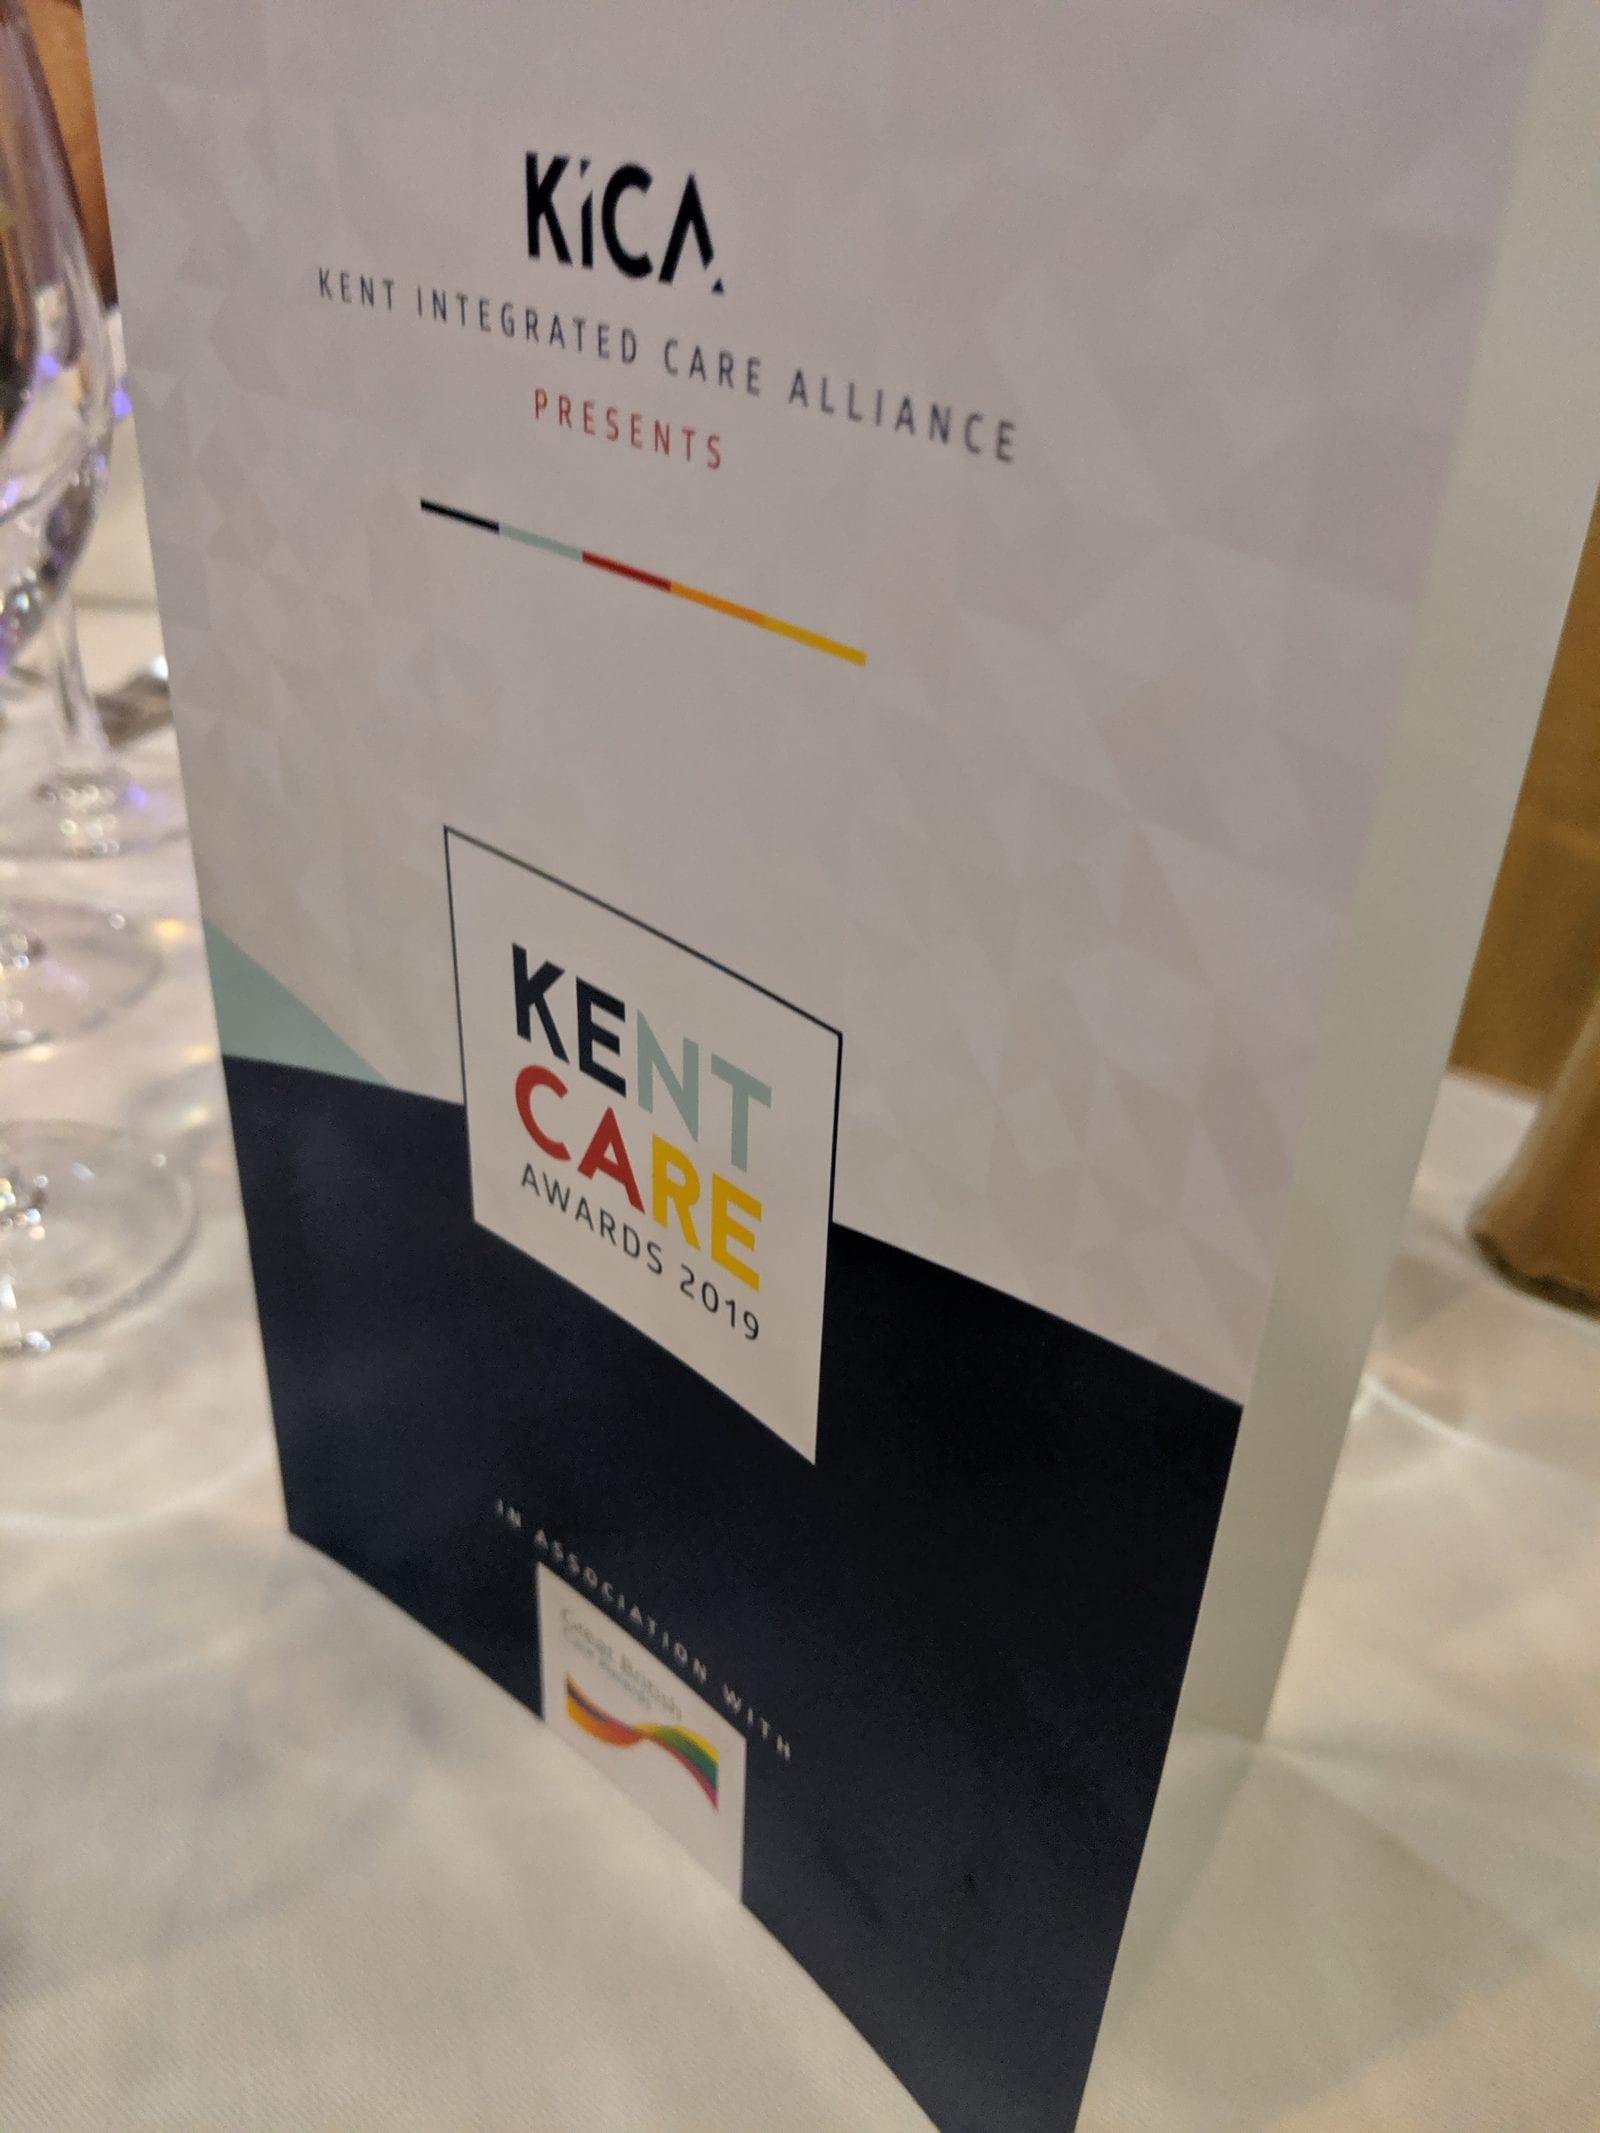 KICA awards